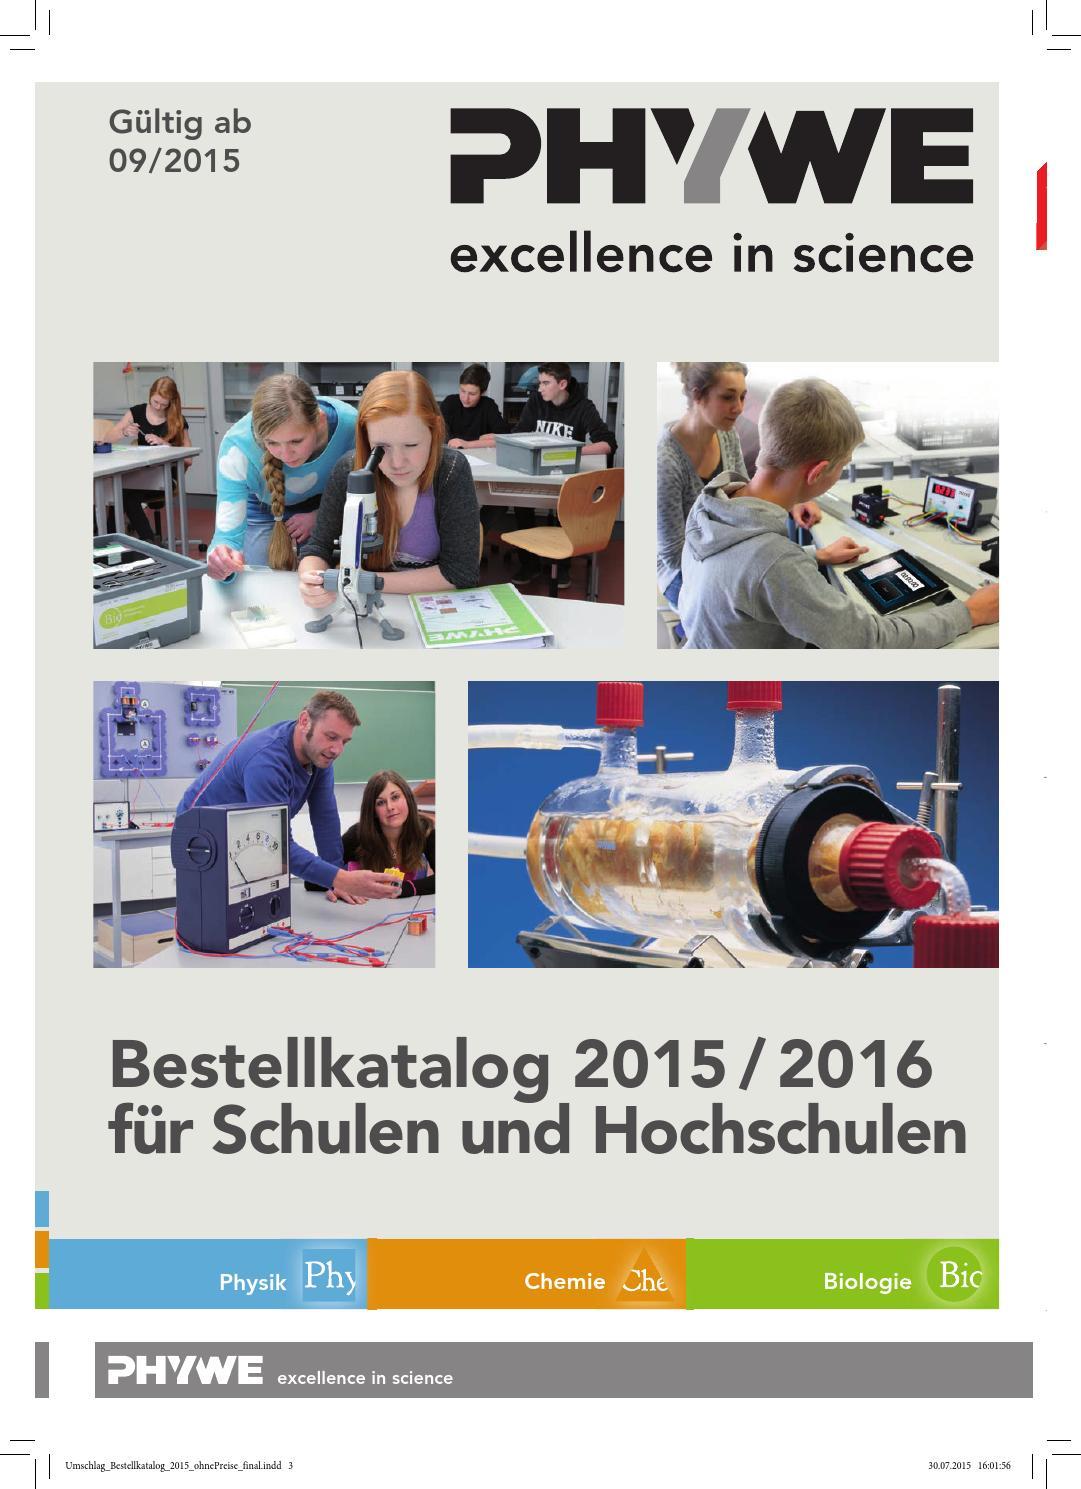 PHYWE Bestellkatalog 2015 - 2016 Lehrsysteme Physik Chemie ohne ...